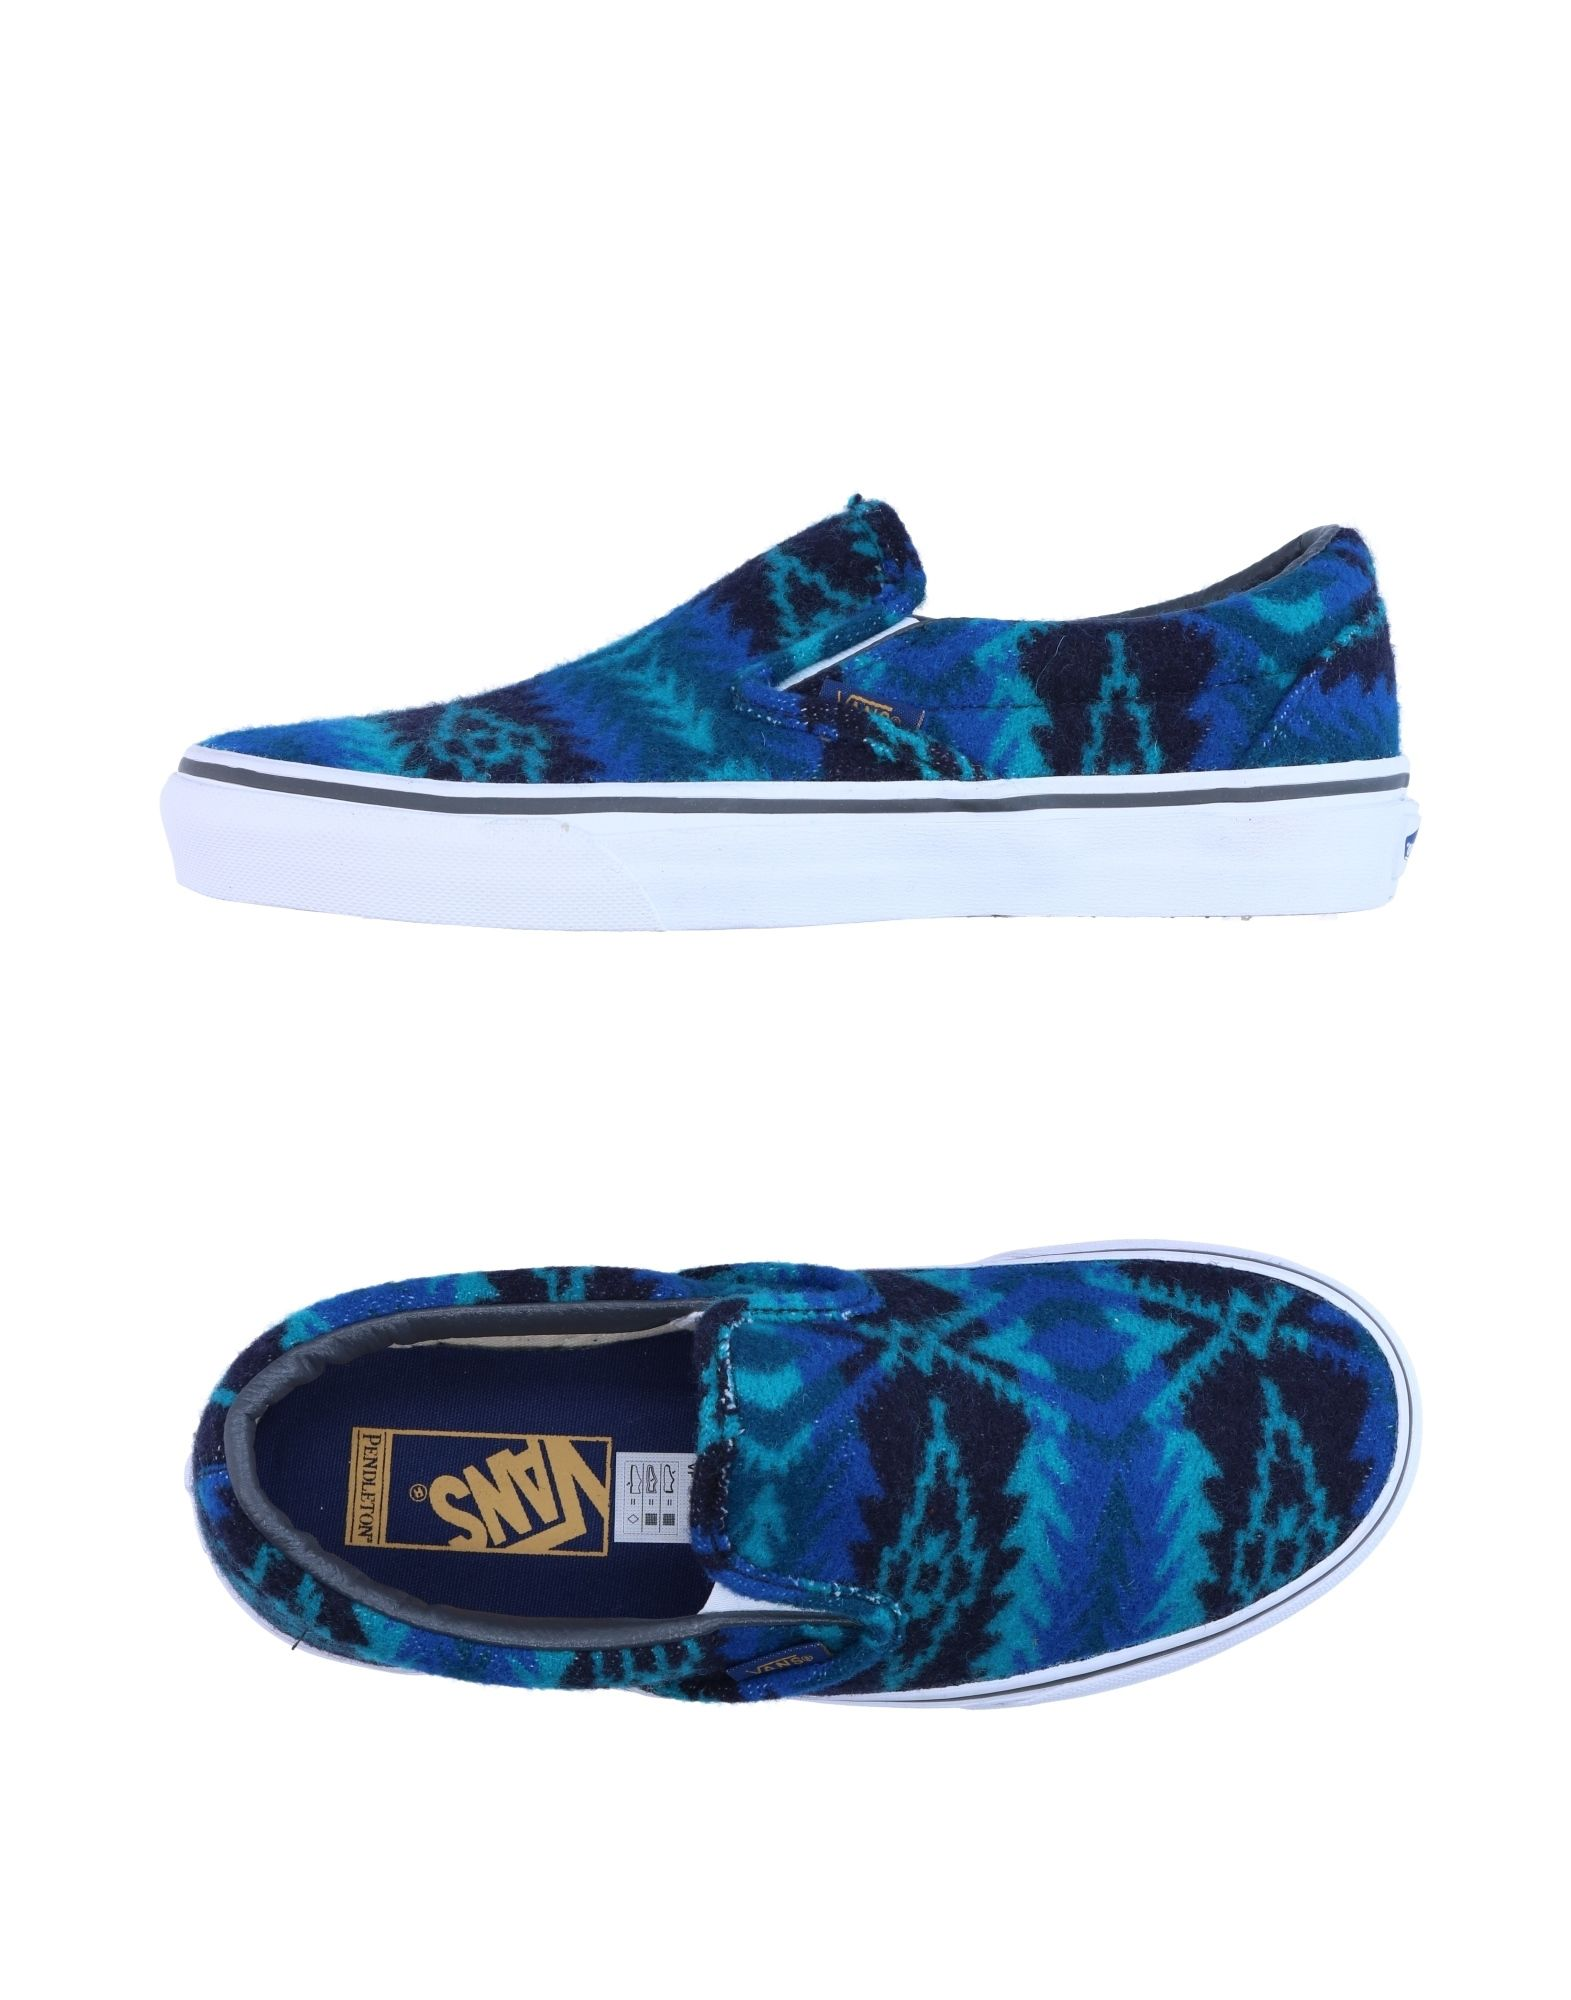 Pendleton By Vans Sneakers Damen  11281129KC Gute Qualität beliebte Schuhe